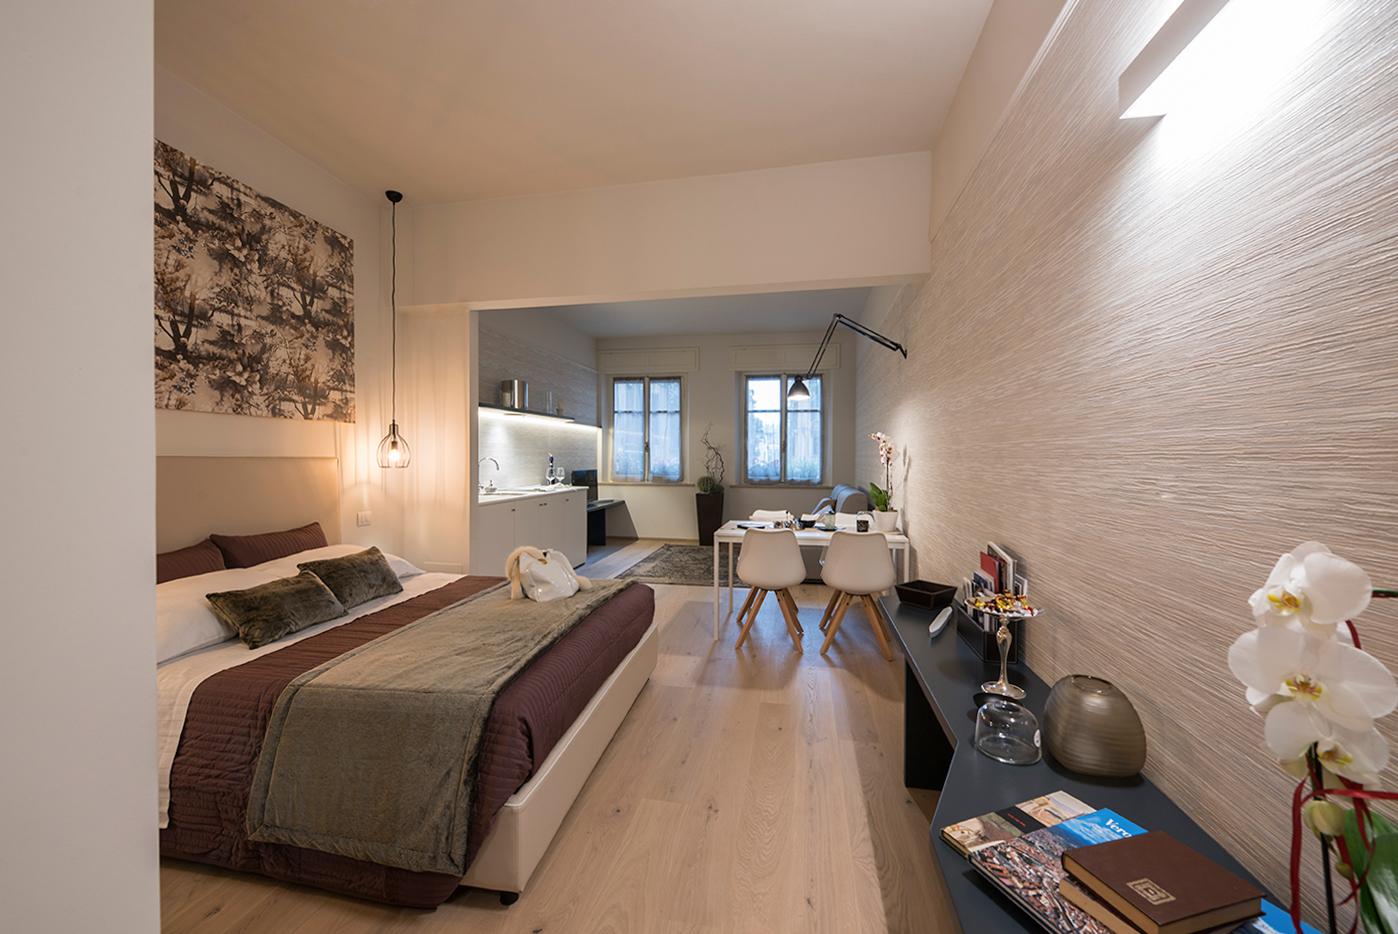 Appartamenti in via Quattro Spade (6).jpg